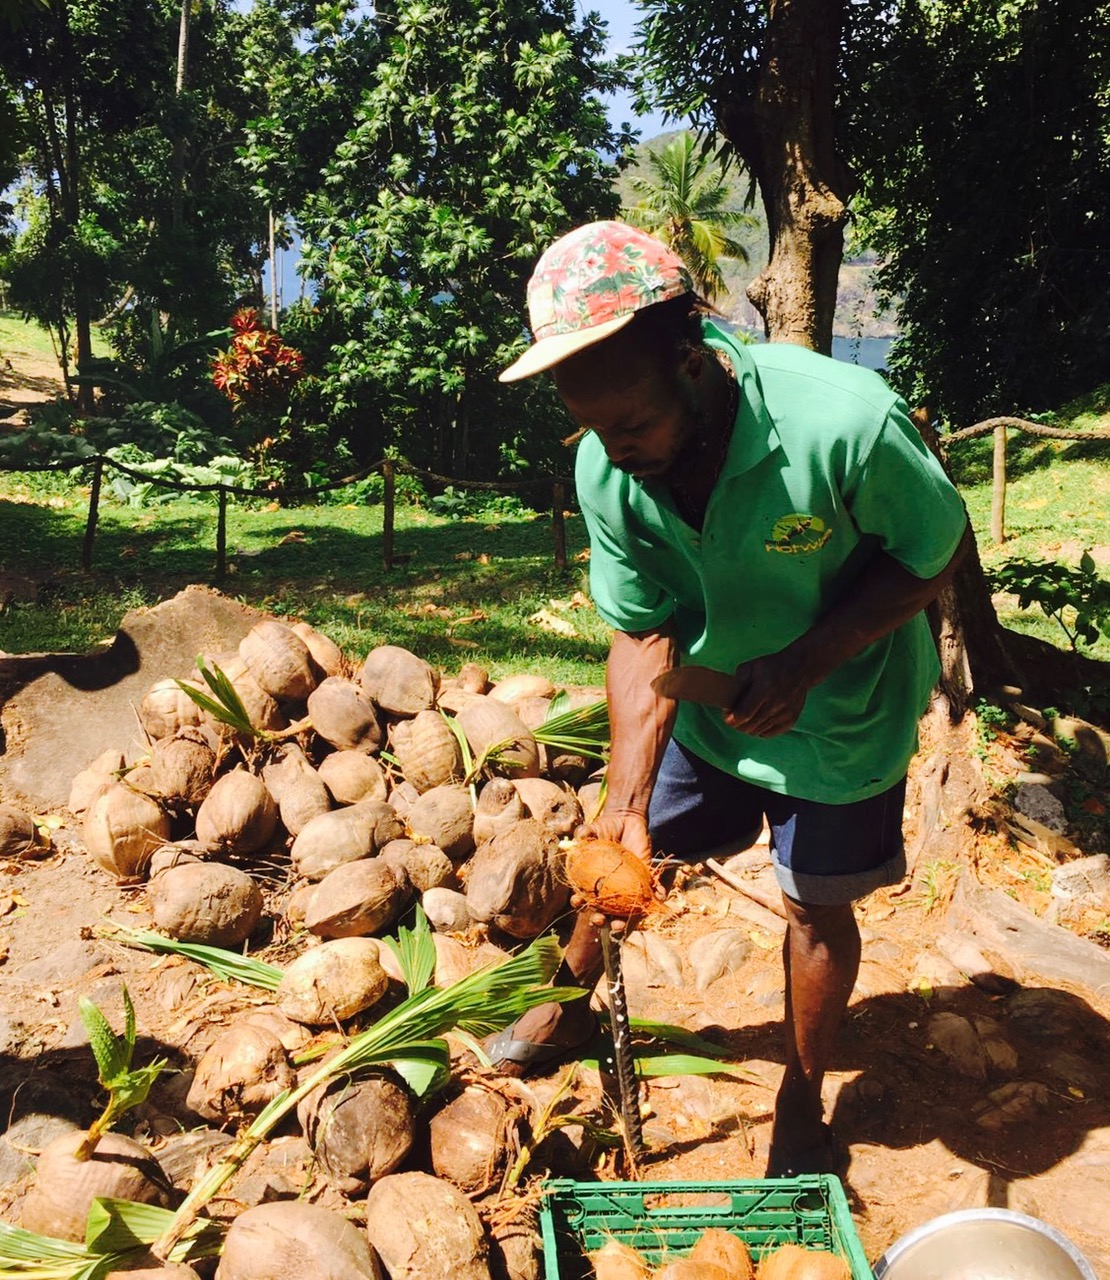 Kokosnussverkostung, Plantage Morne Coubaril Estate, St. Lucia